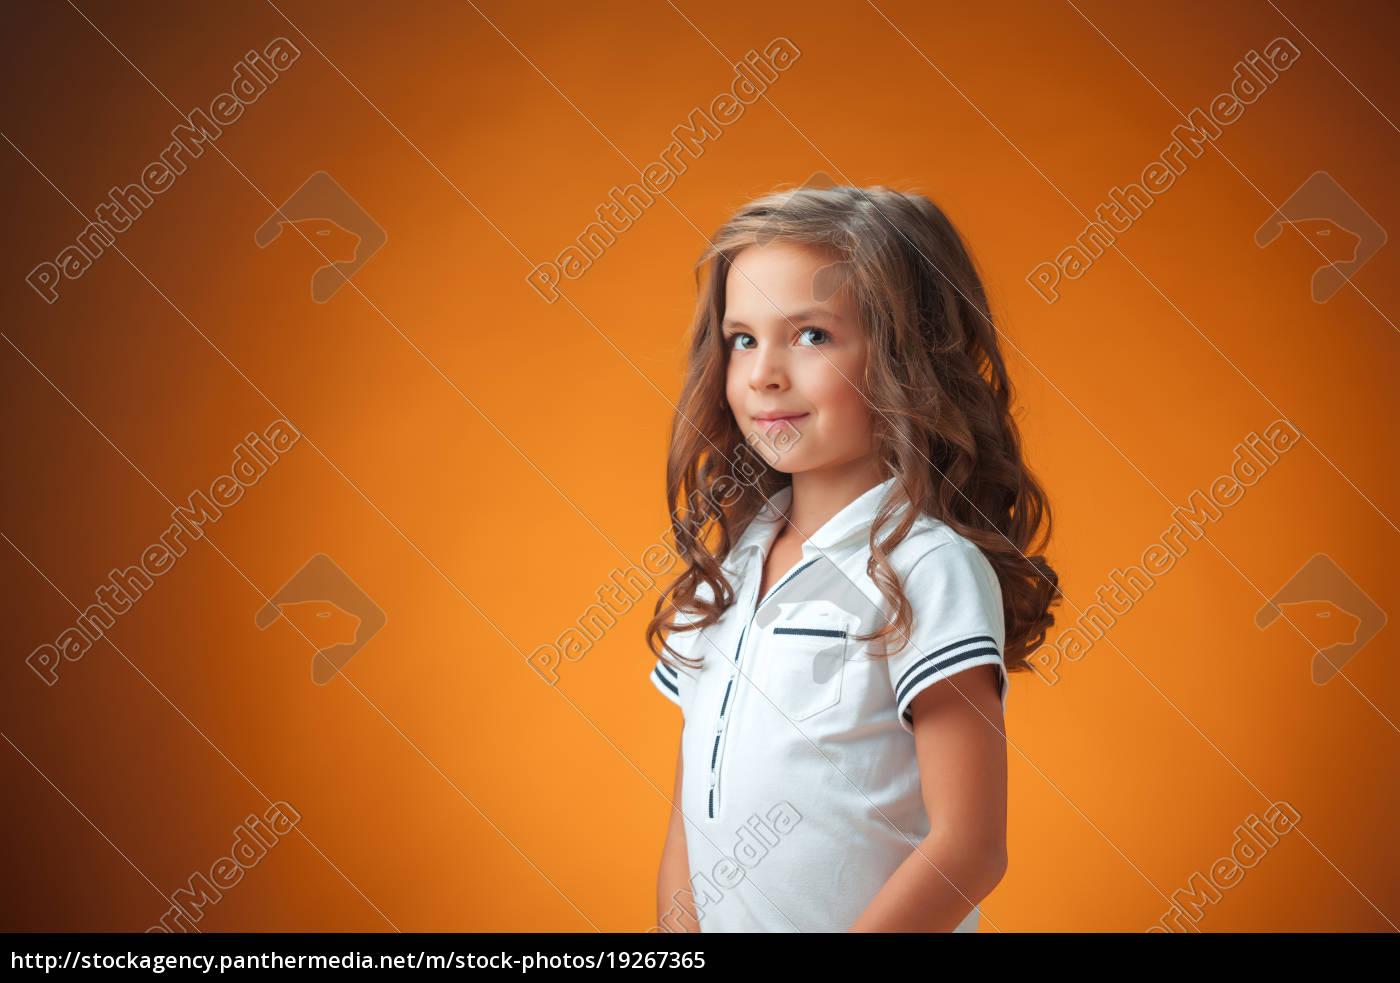 the, cute, cheerful, little, girl, on - 19267365